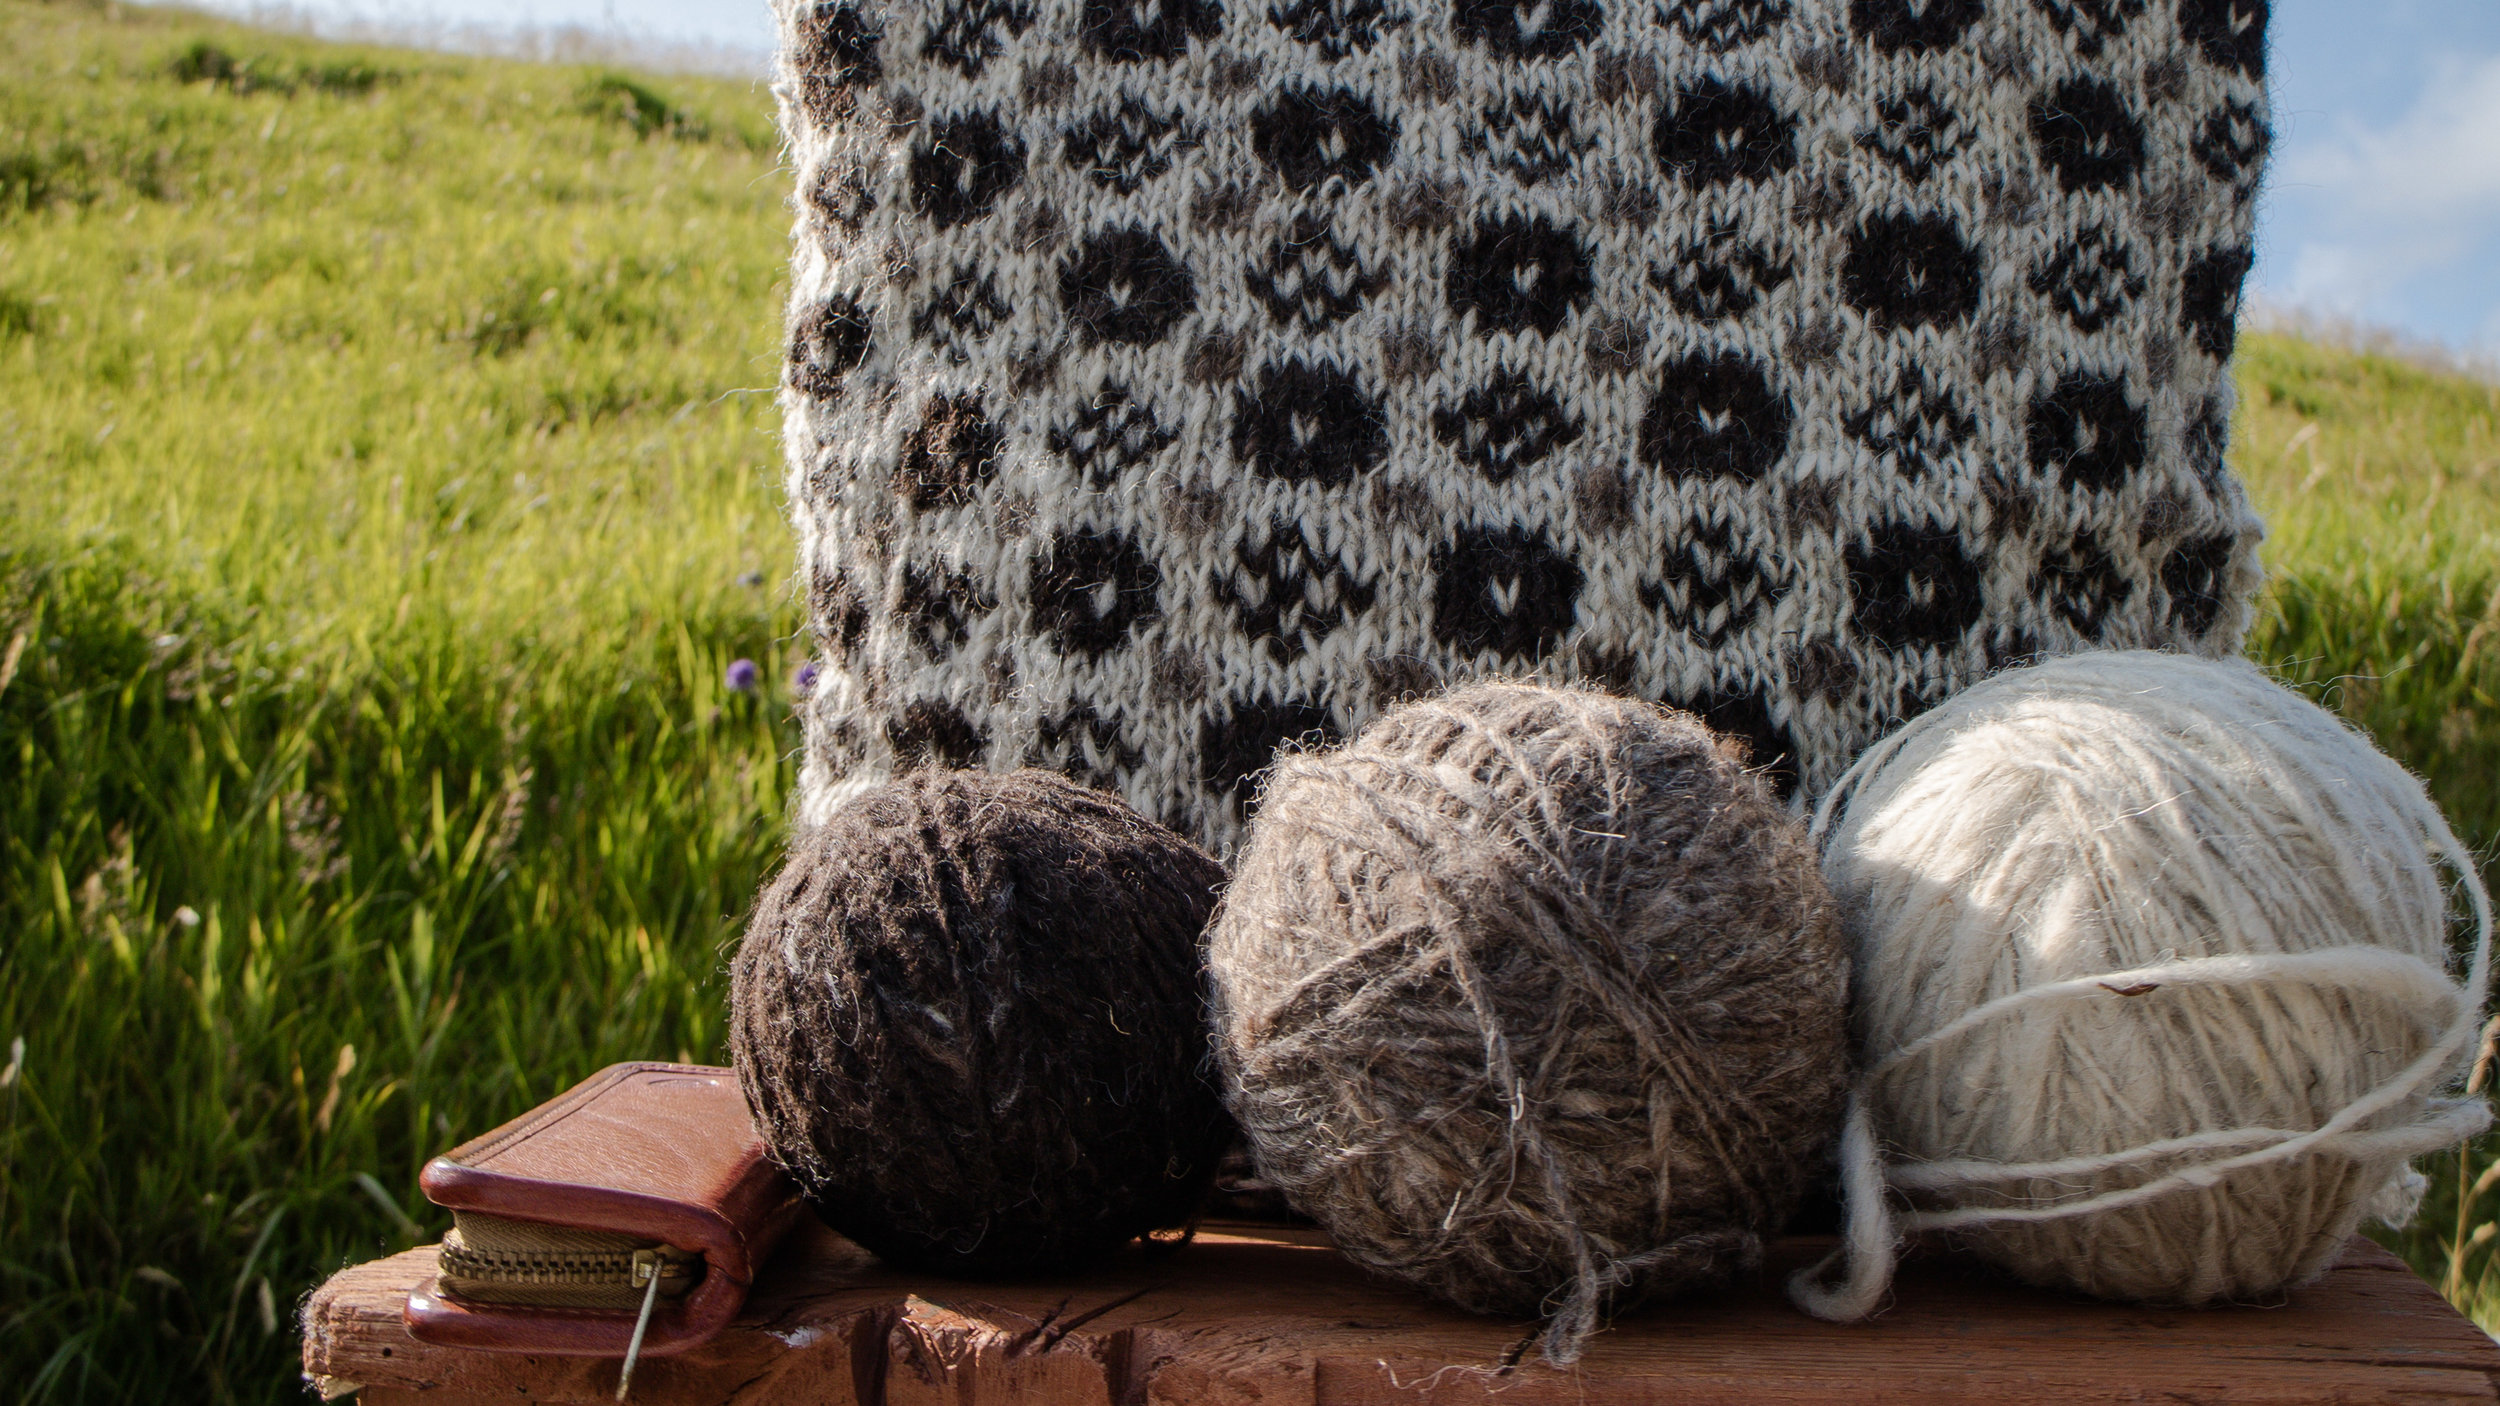 Skattakista Unsere Wolle © My Faroe Islands, Anja Mazuhn  (1 von 1).jpg